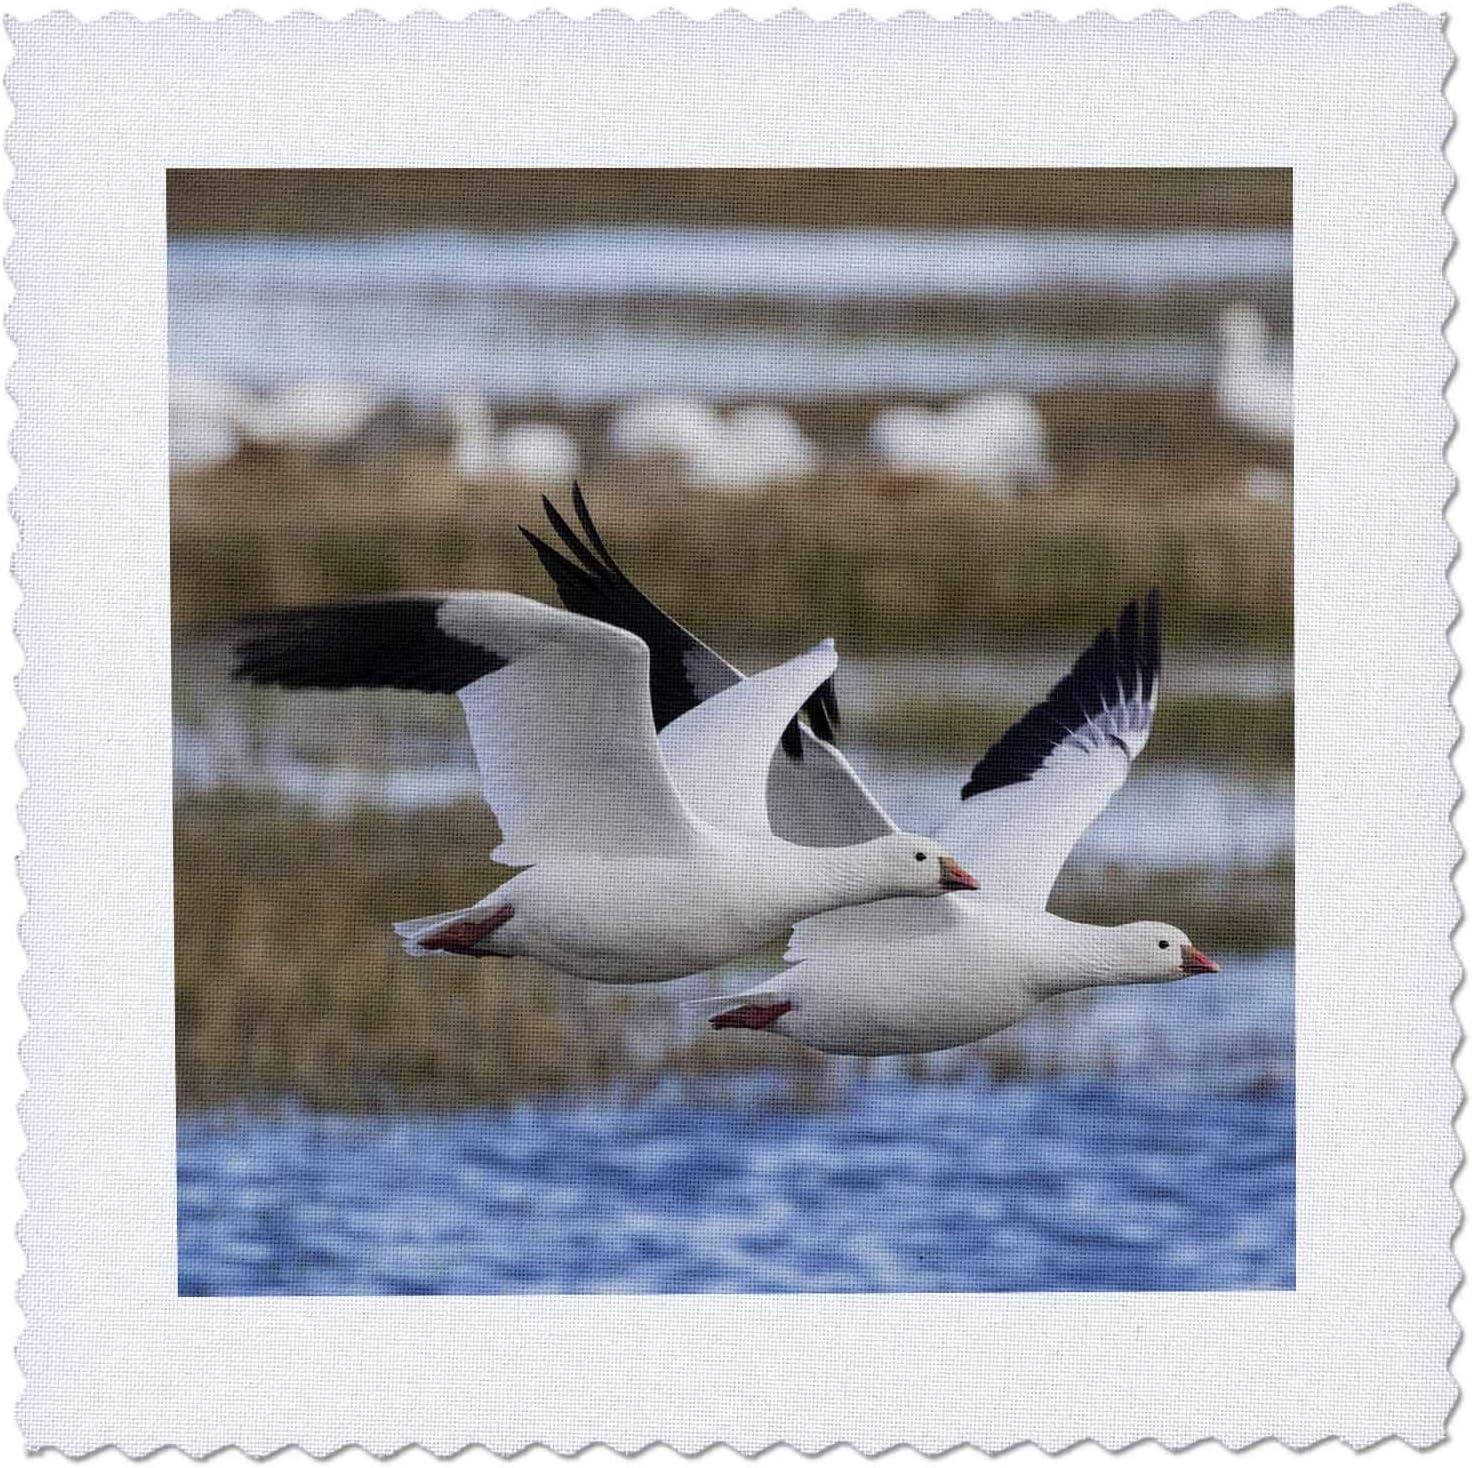 Max 77% OFF 3dRose Danita Delimont - Geese Squares 5 popular pair Ross Quilt geese